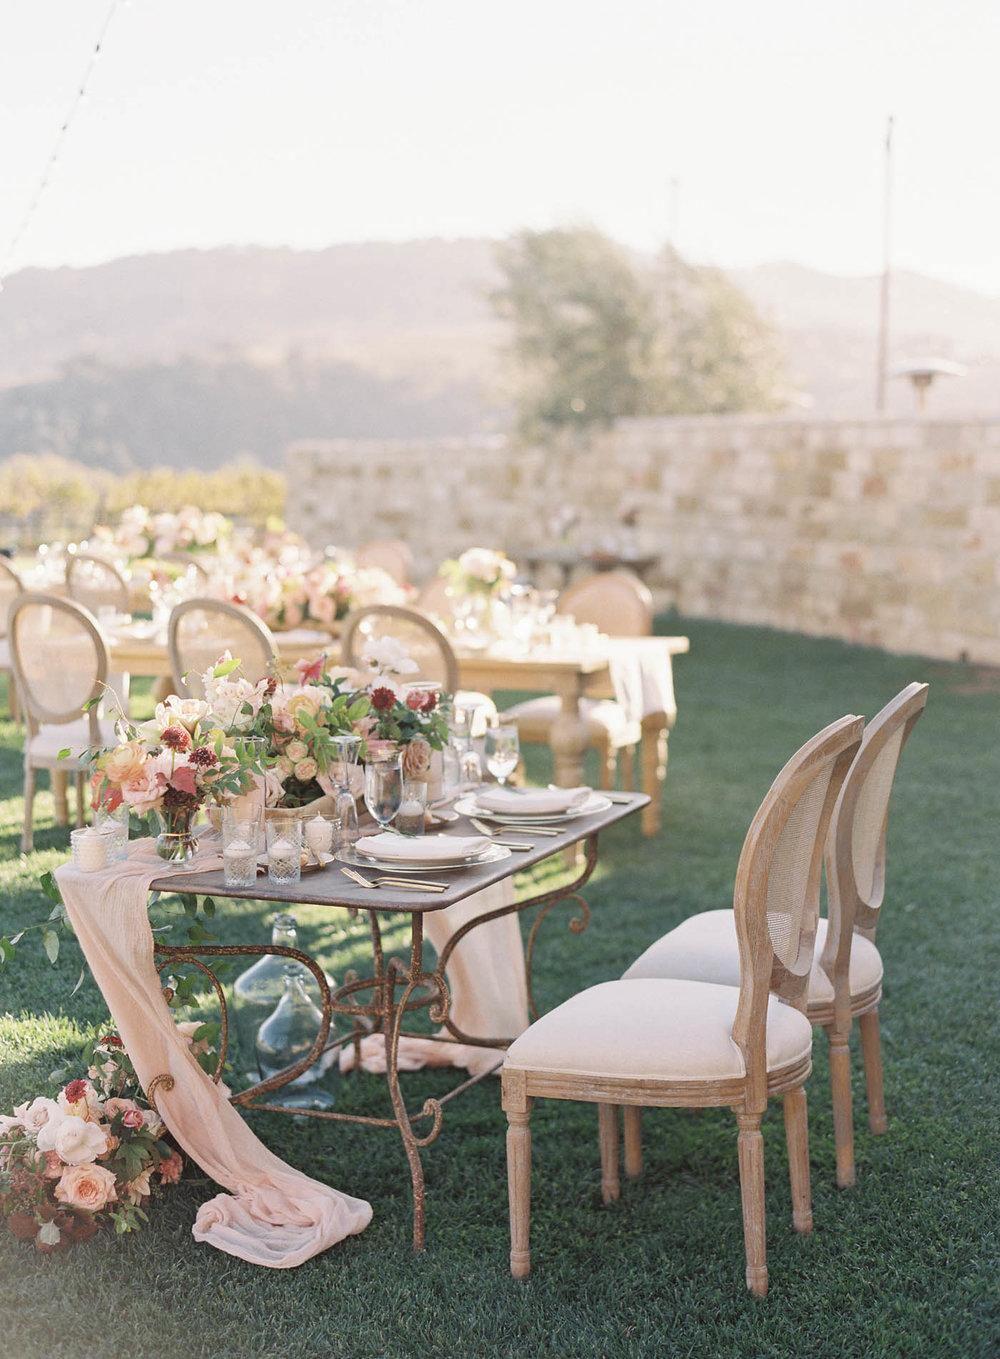 sunstone-villa-wedding-28-Jen_Huang-RD-159-Jen_Huang-009584-R1-014.jpg